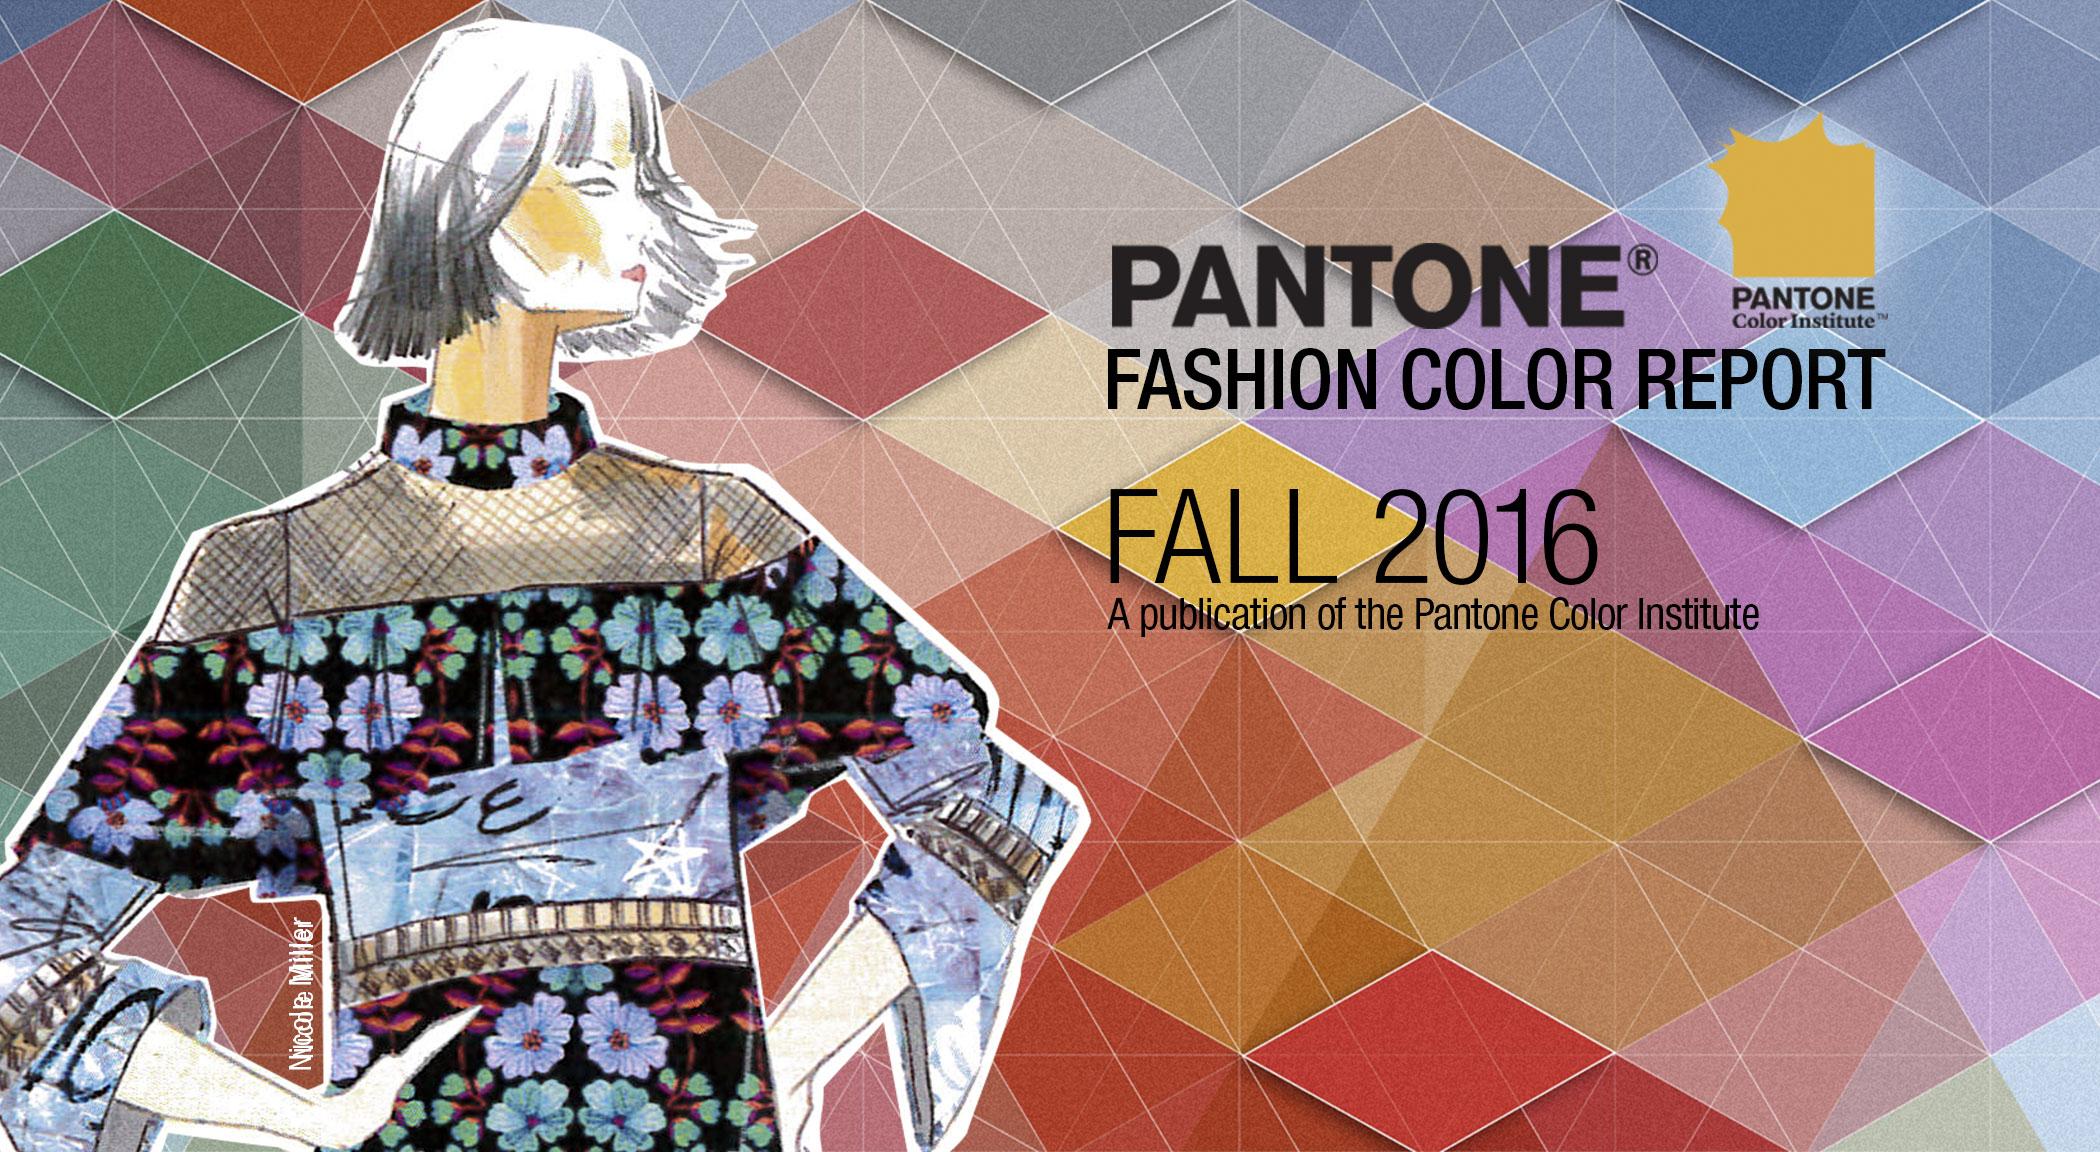 Pantone-Fashion-Color-Report-Fall-2016